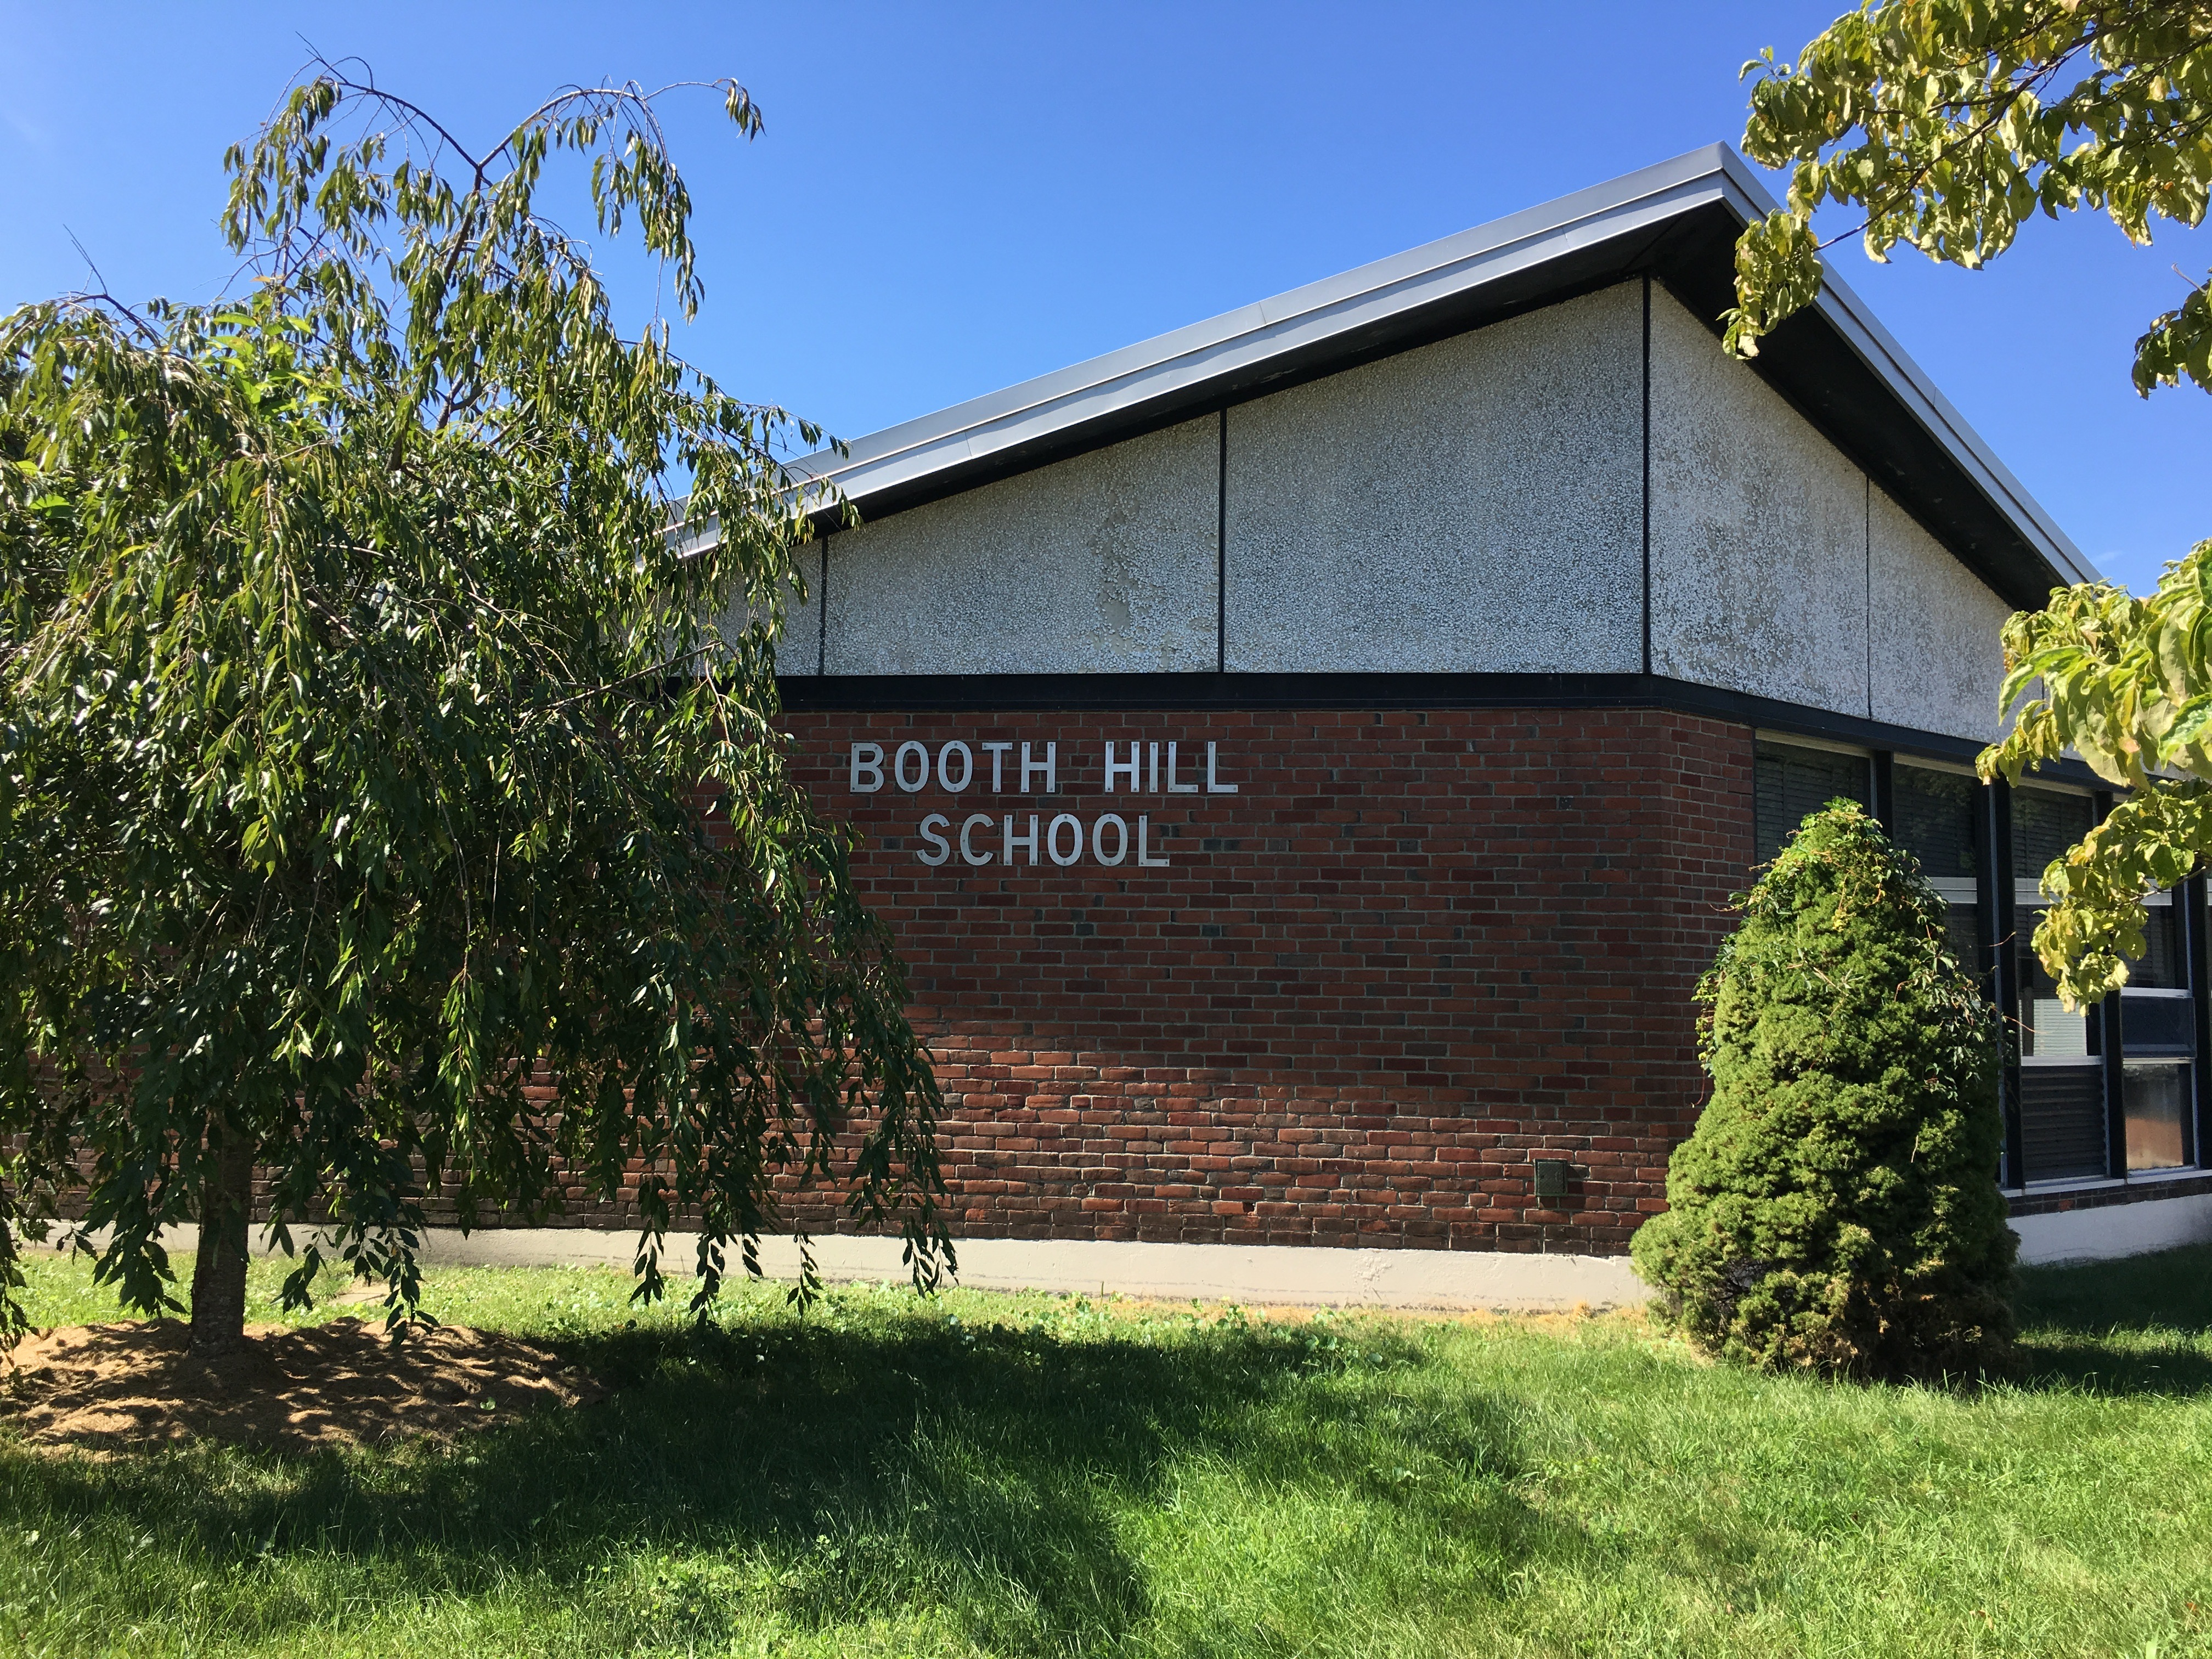 Booth Hill School Trumbull Ct pertaining to Trumbull School Calendar